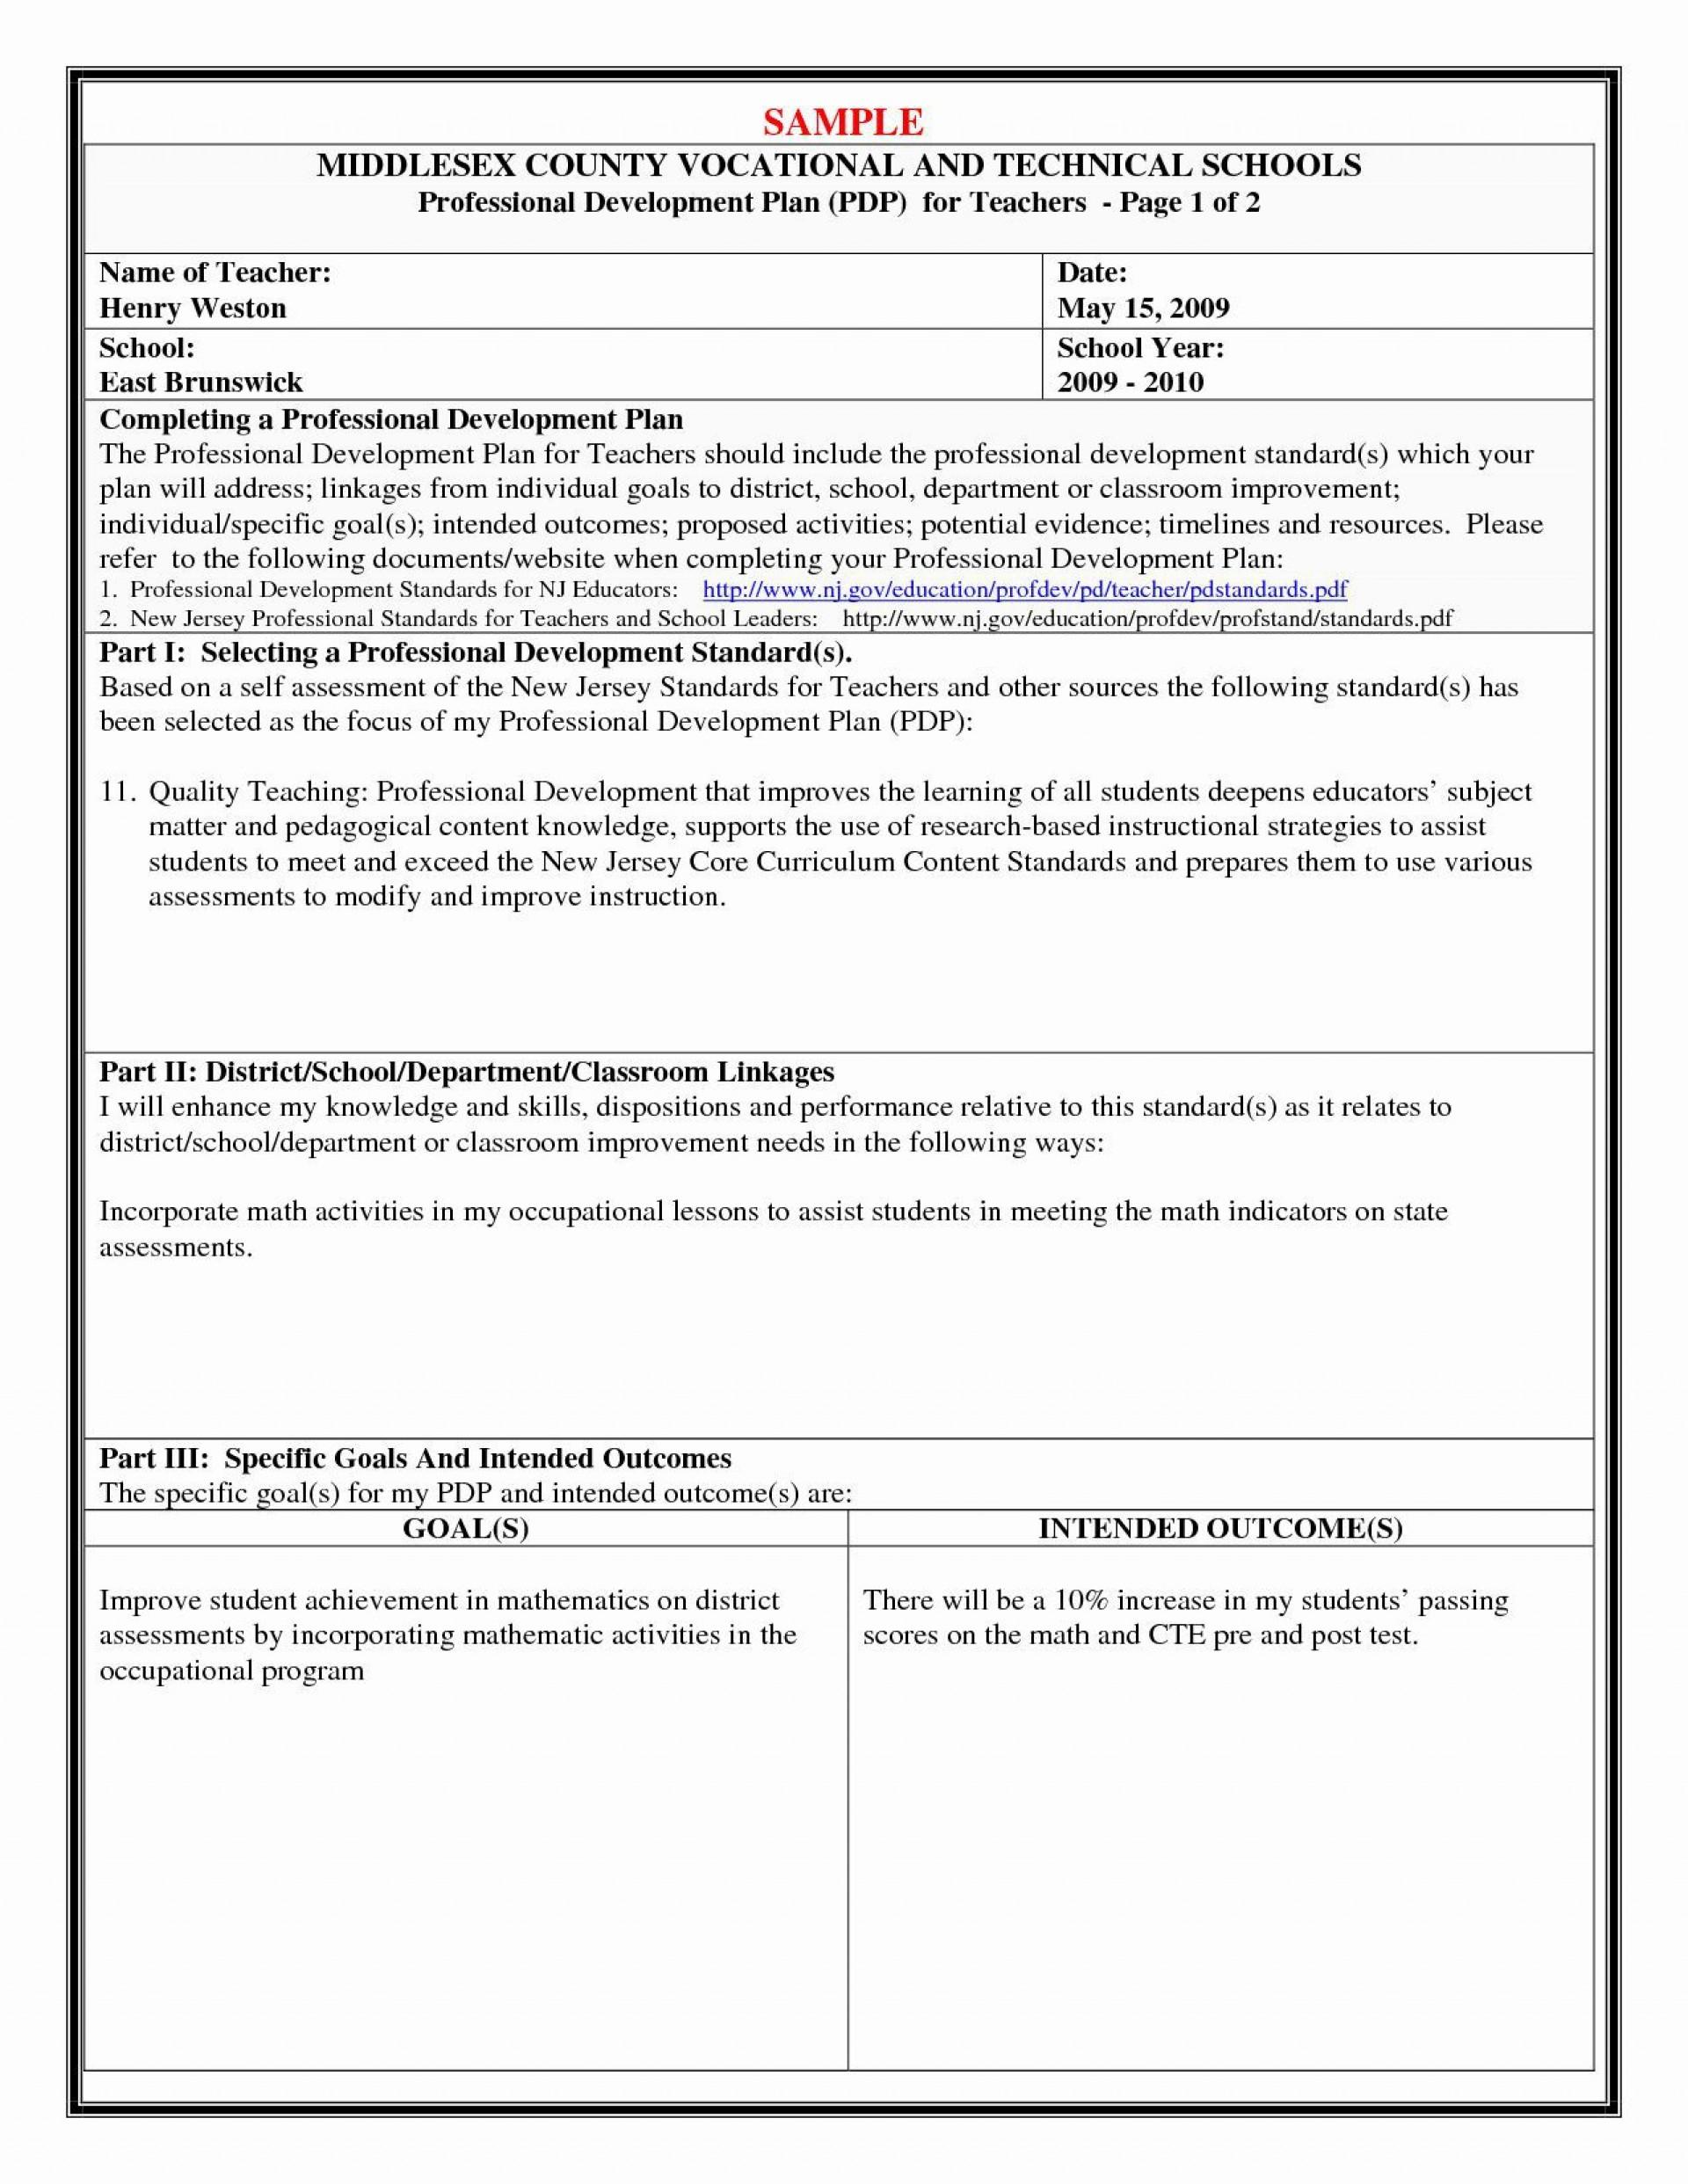 001 Remarkable Professional Development Plan For Teacher Template Doc High Def 1920